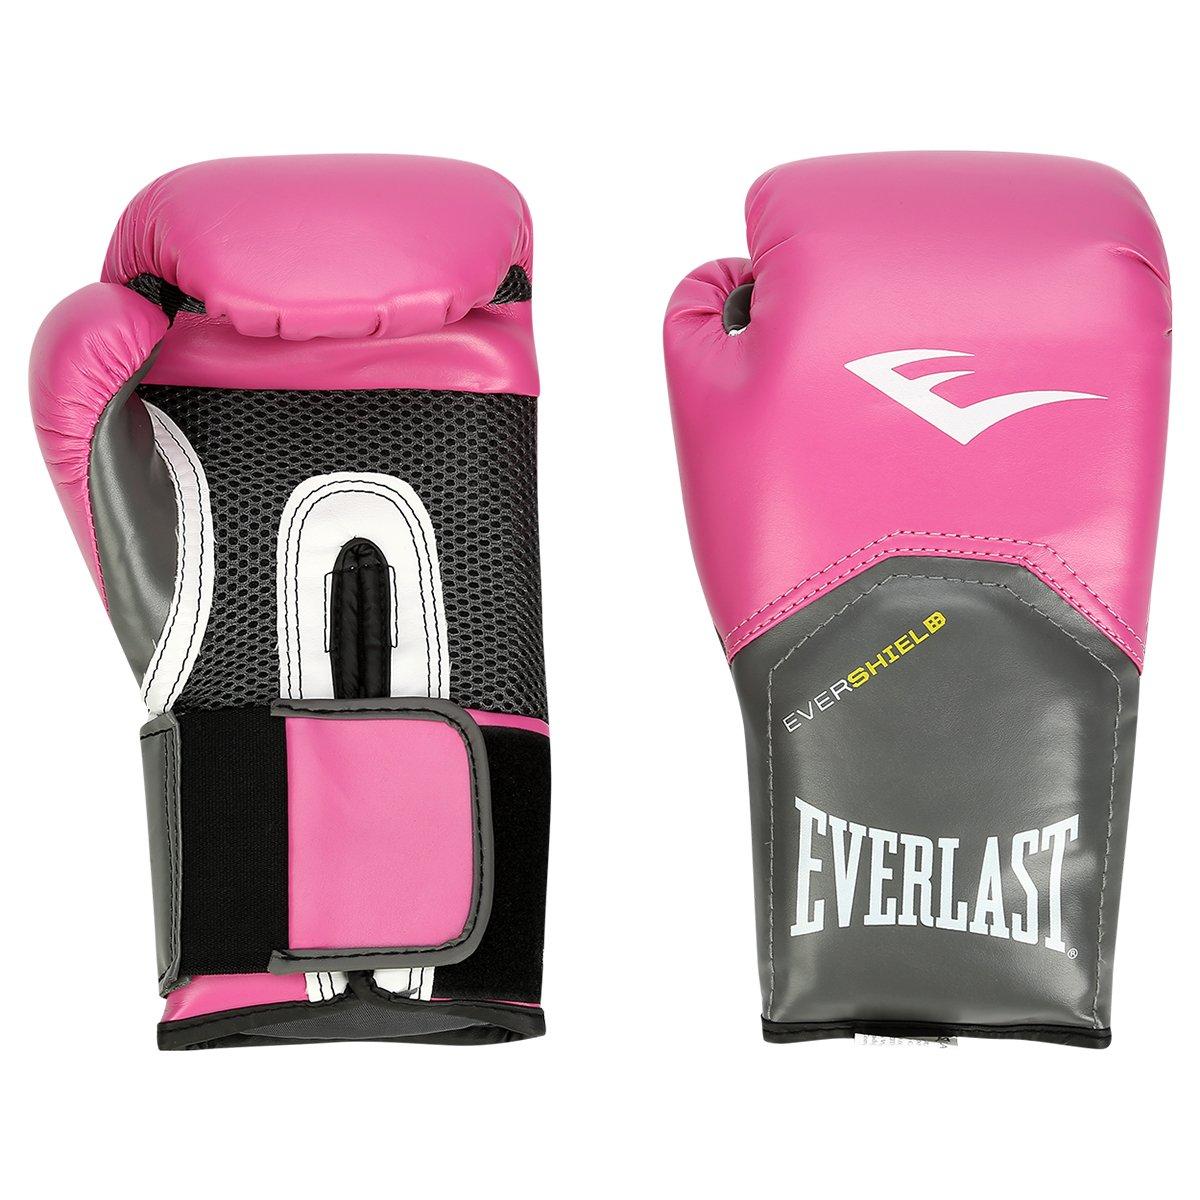 Luva de Boxe Everlast Pro Style - 8 oz - Pink - Compre Agora  a70ce5514373c